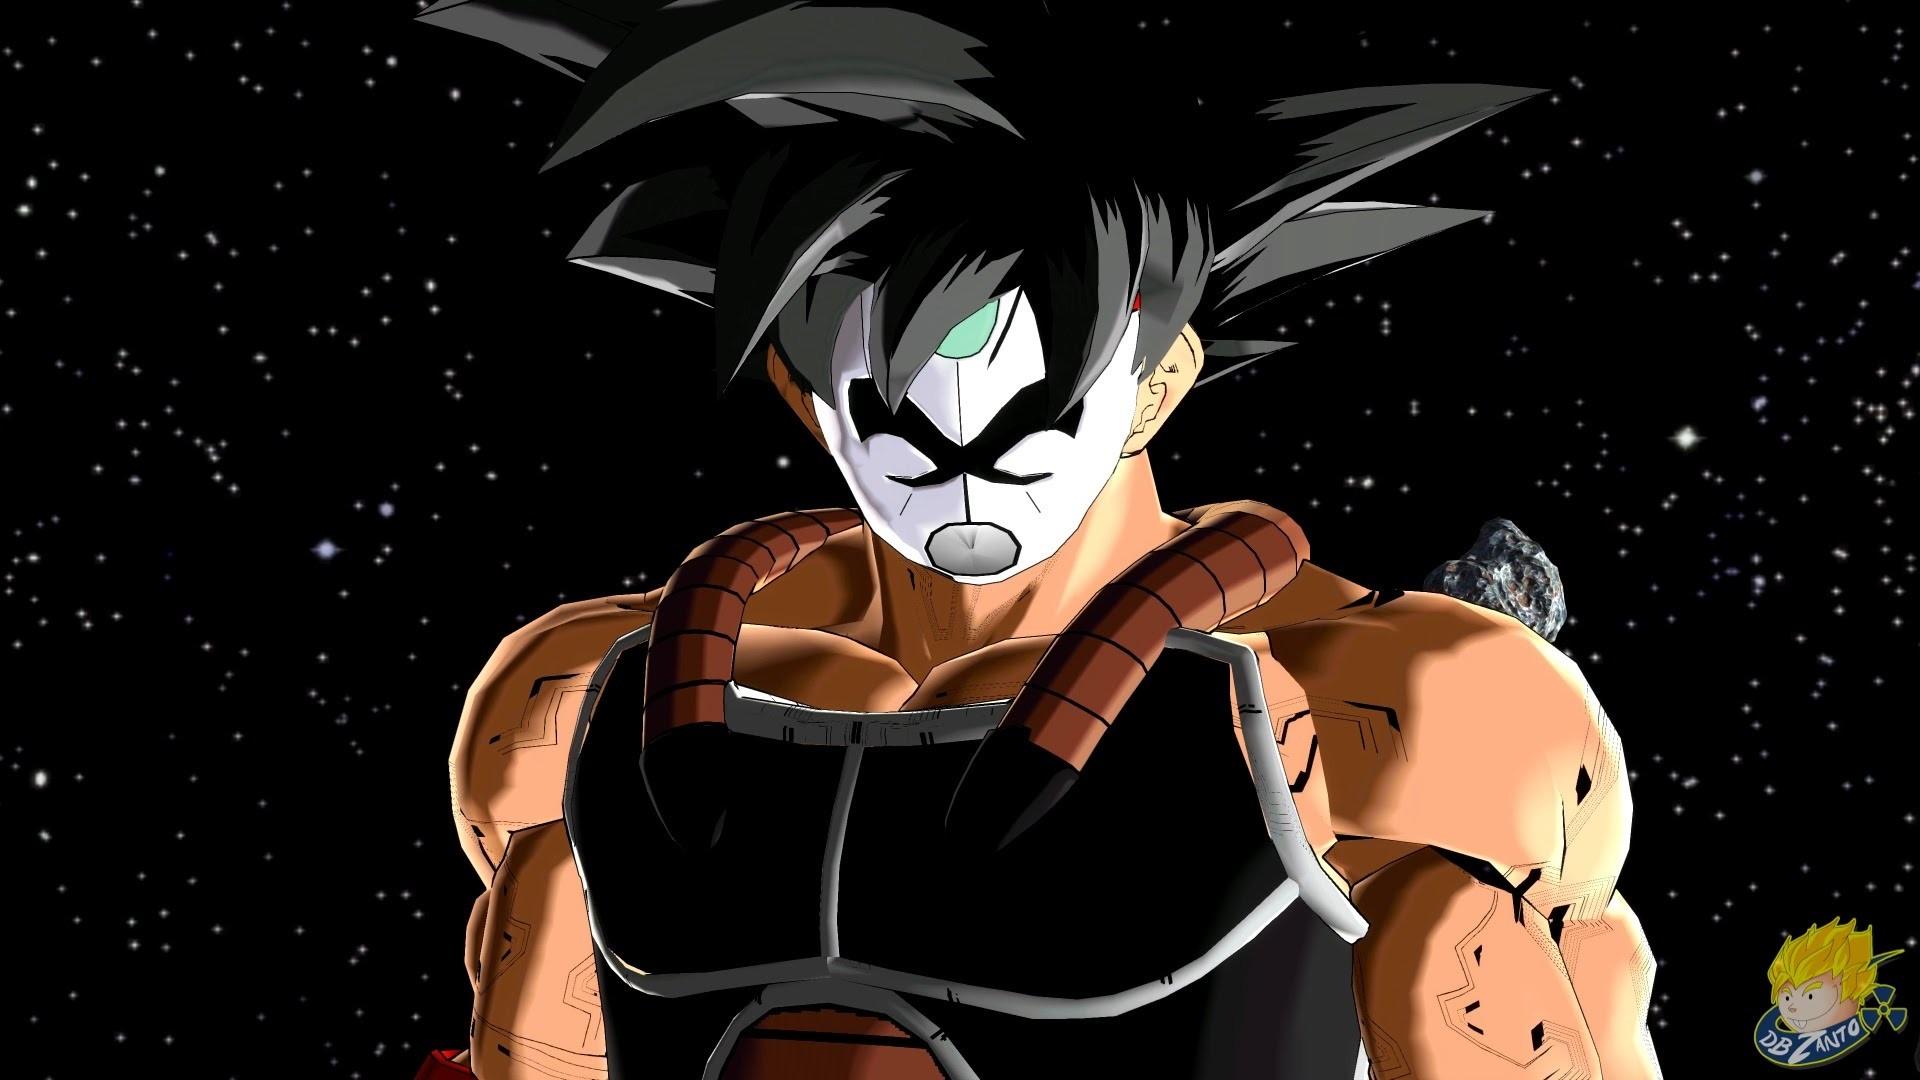 Dragon Ball Xenoverse (PC): Time Breaker Bardock Vs SSJ4 Gogeta Gameplay  [MOD] 【60FPS 1080P】 – YouTube